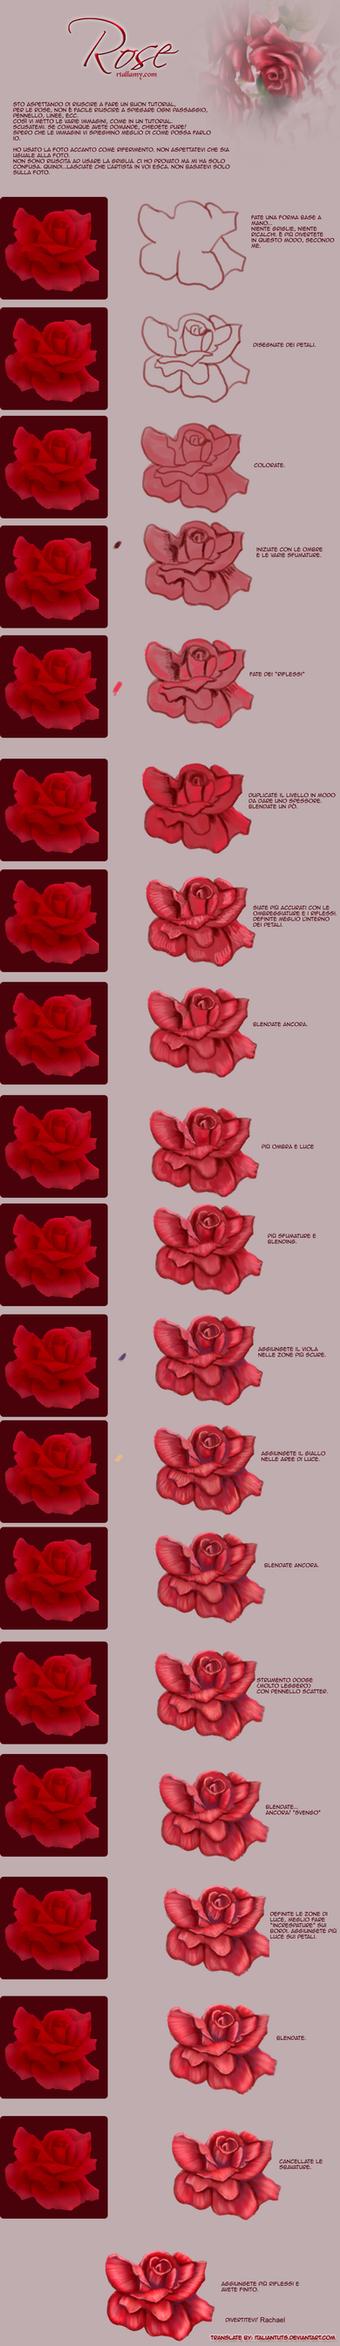 Tutorial painting rose -ITA- by ItalianTuts